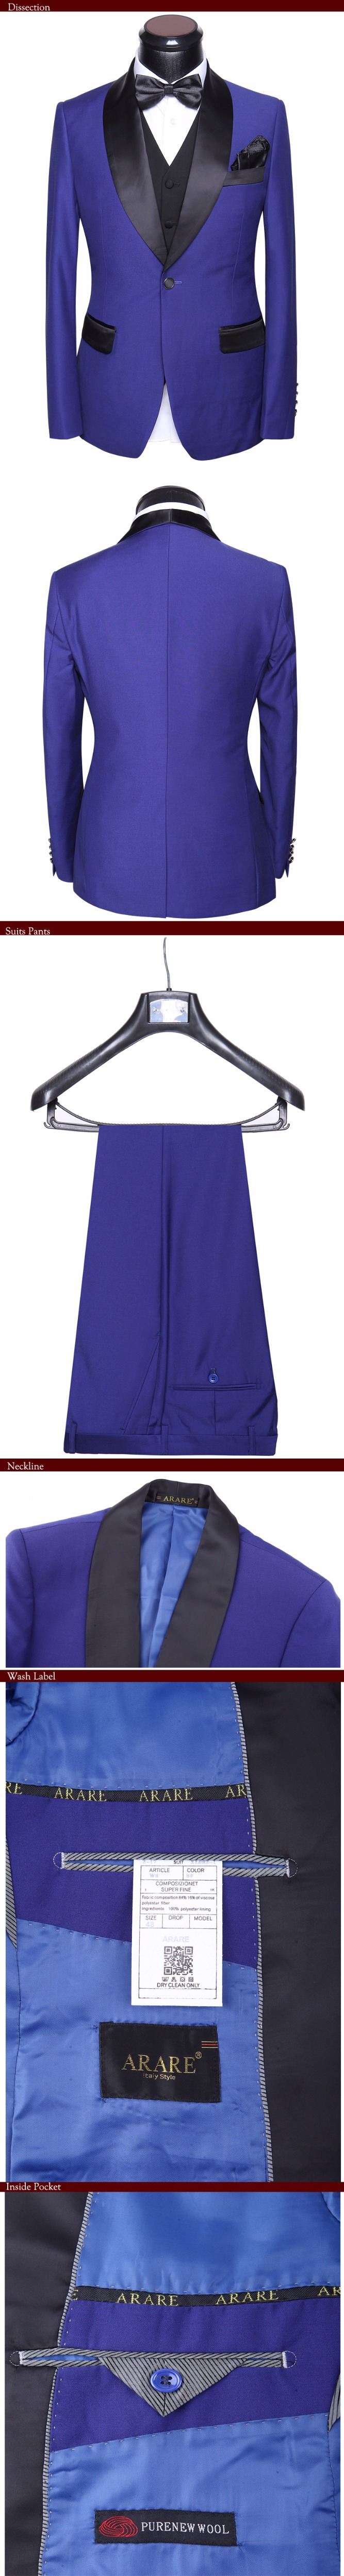 HTB1khVDaQfb uJkSnhJq6zdDVXaJ - Men Wedding Dress Suits 2017 Latest 5 piece Groom Wedding Suit Set Slim Fit Round Collar Prom Party Black-tie Dress